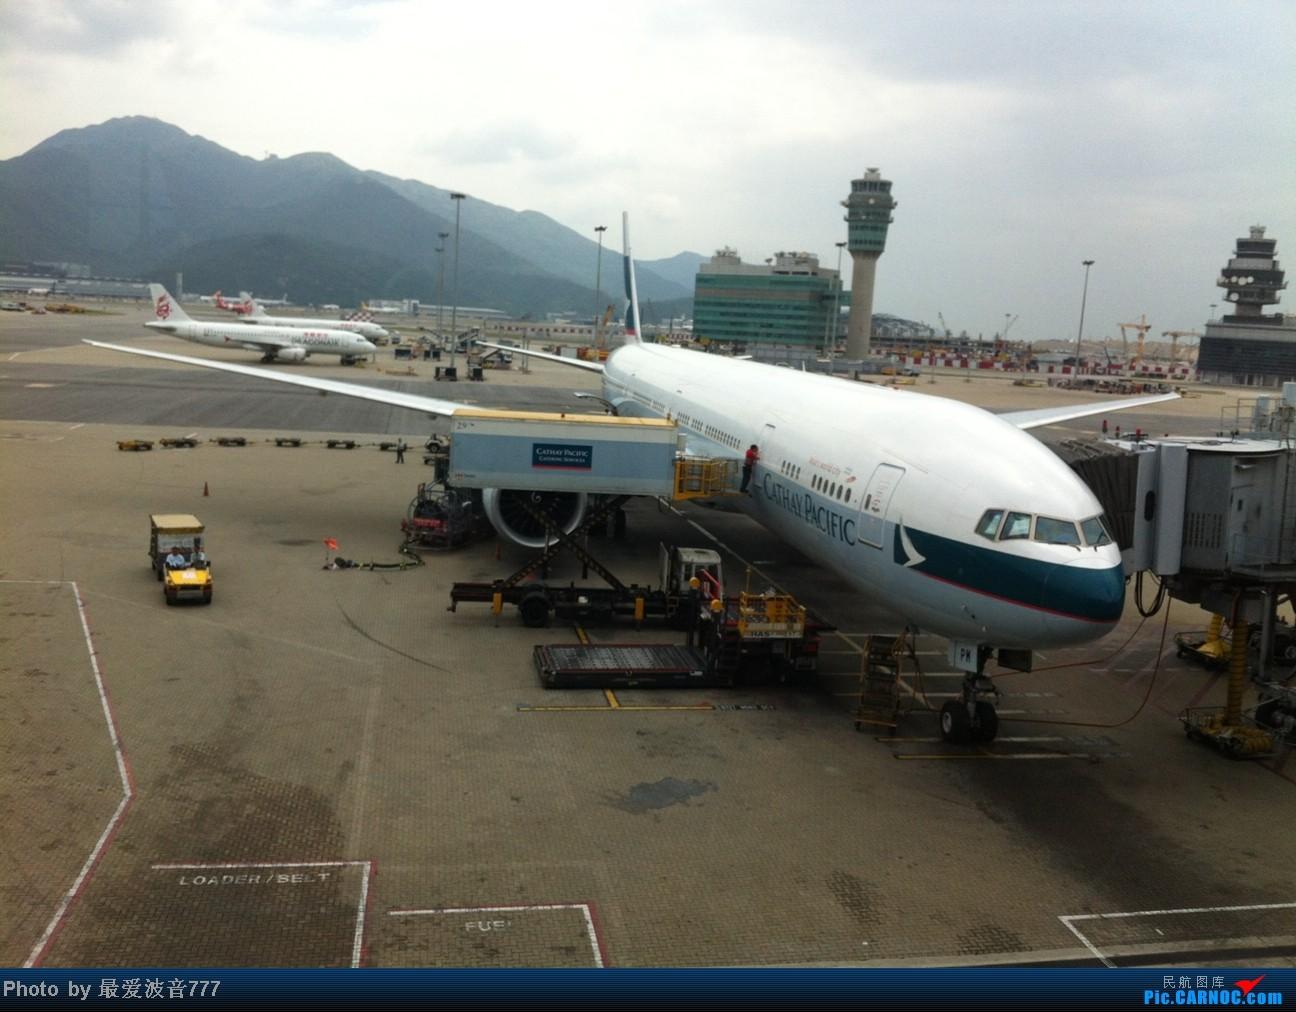 Re:[原创]假期的回国往返之旅 LHR-HKG-CTU-HKG-LHR, CX+CA+KA联合运营 BOEING 777-300ER B-KPM 中国香港赤鱲角国际机场